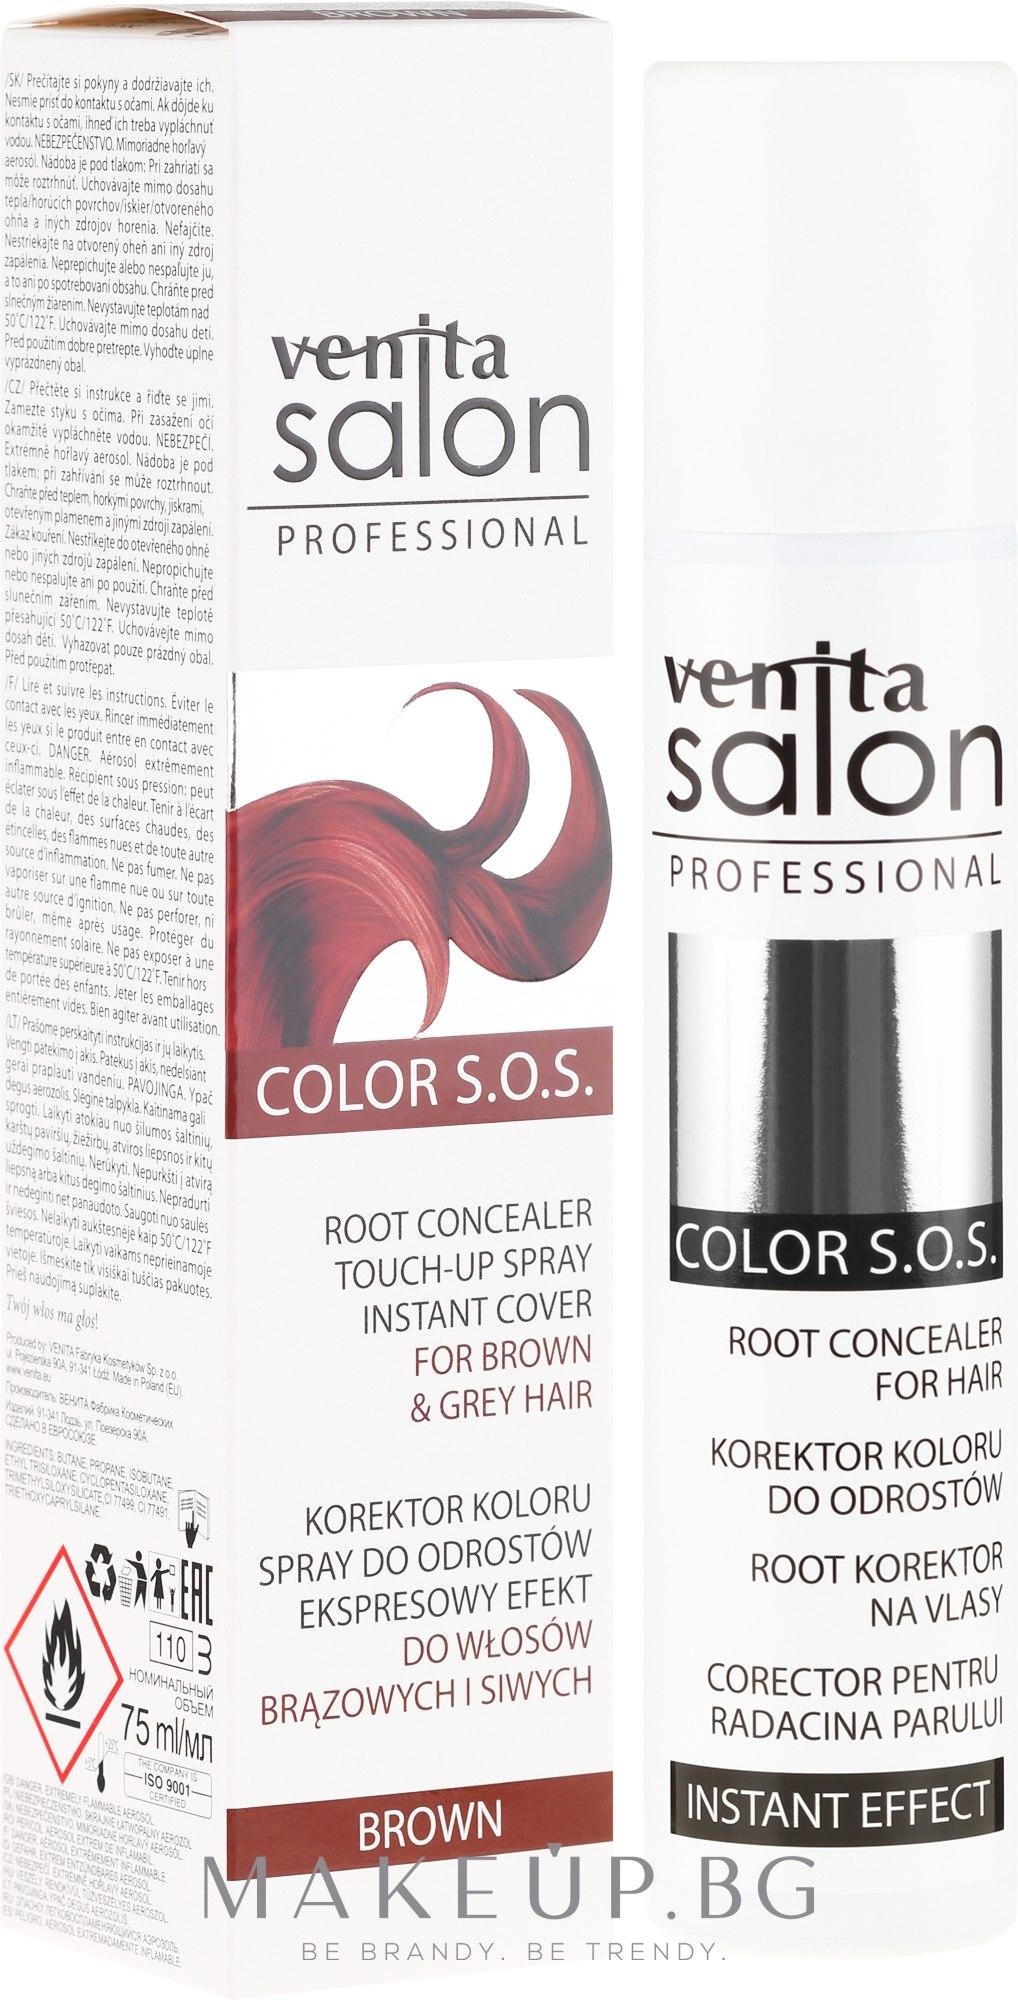 Коректор за коса - Venita Salon Professional Color S.O.S (Brown) — снимка 75 ml